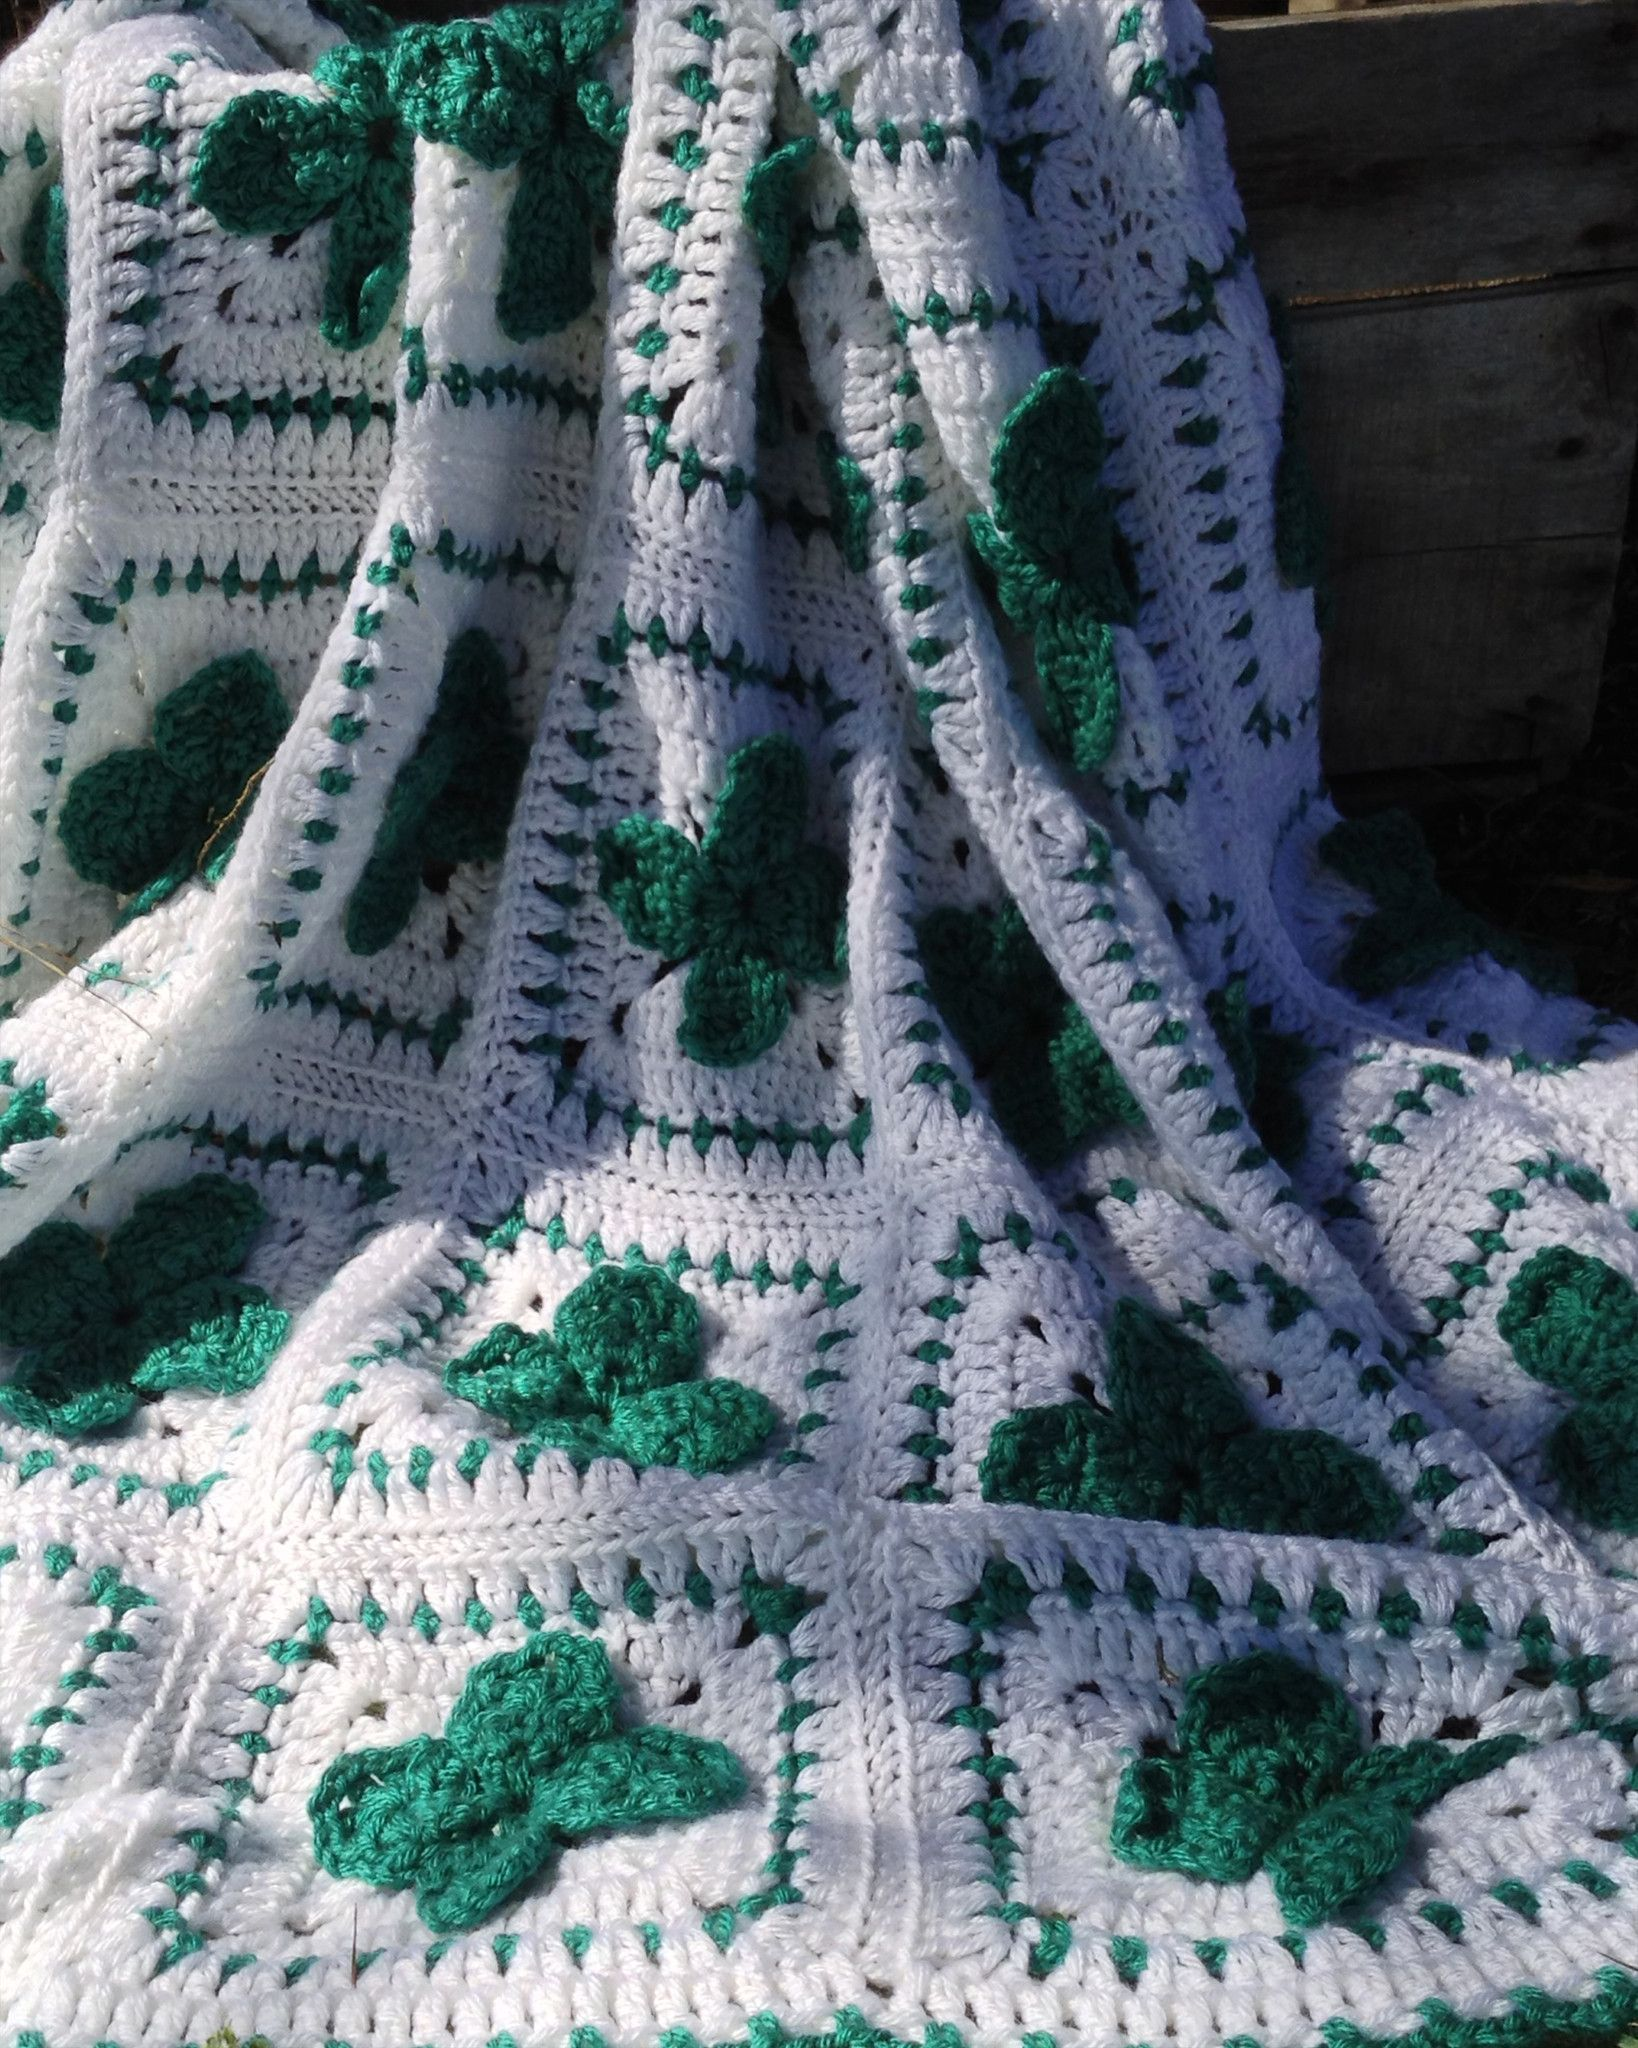 St. Patricks Day Afghan Crochet Pattern